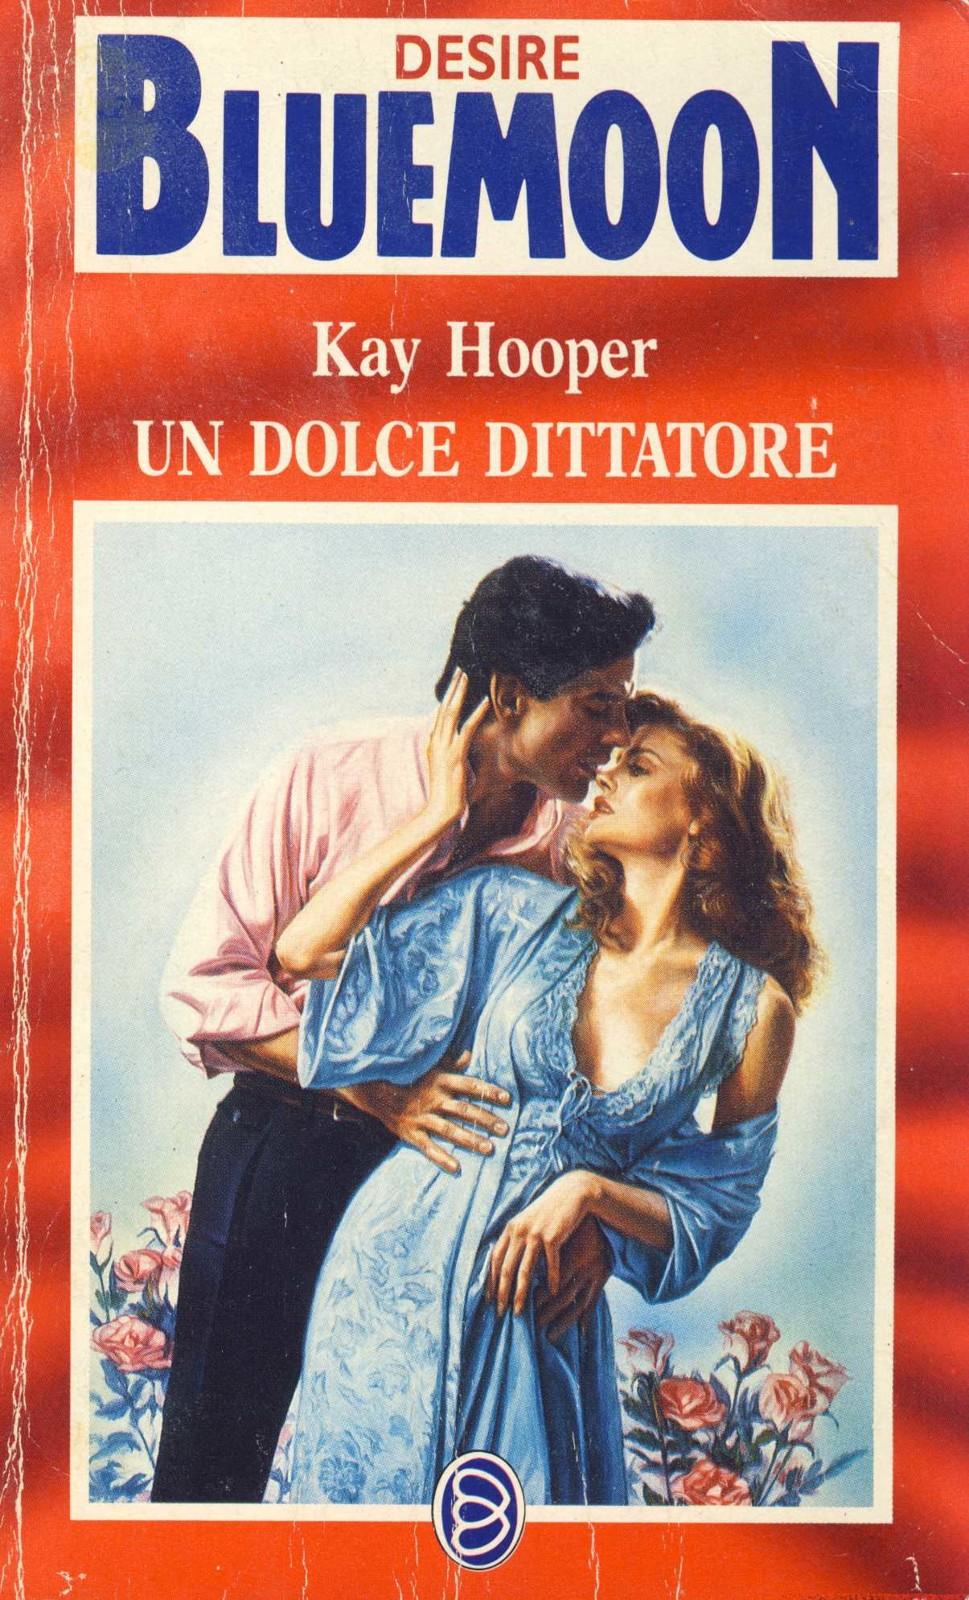 Kay Hooper - Hagen 08. Un dolce dittatore (1990)